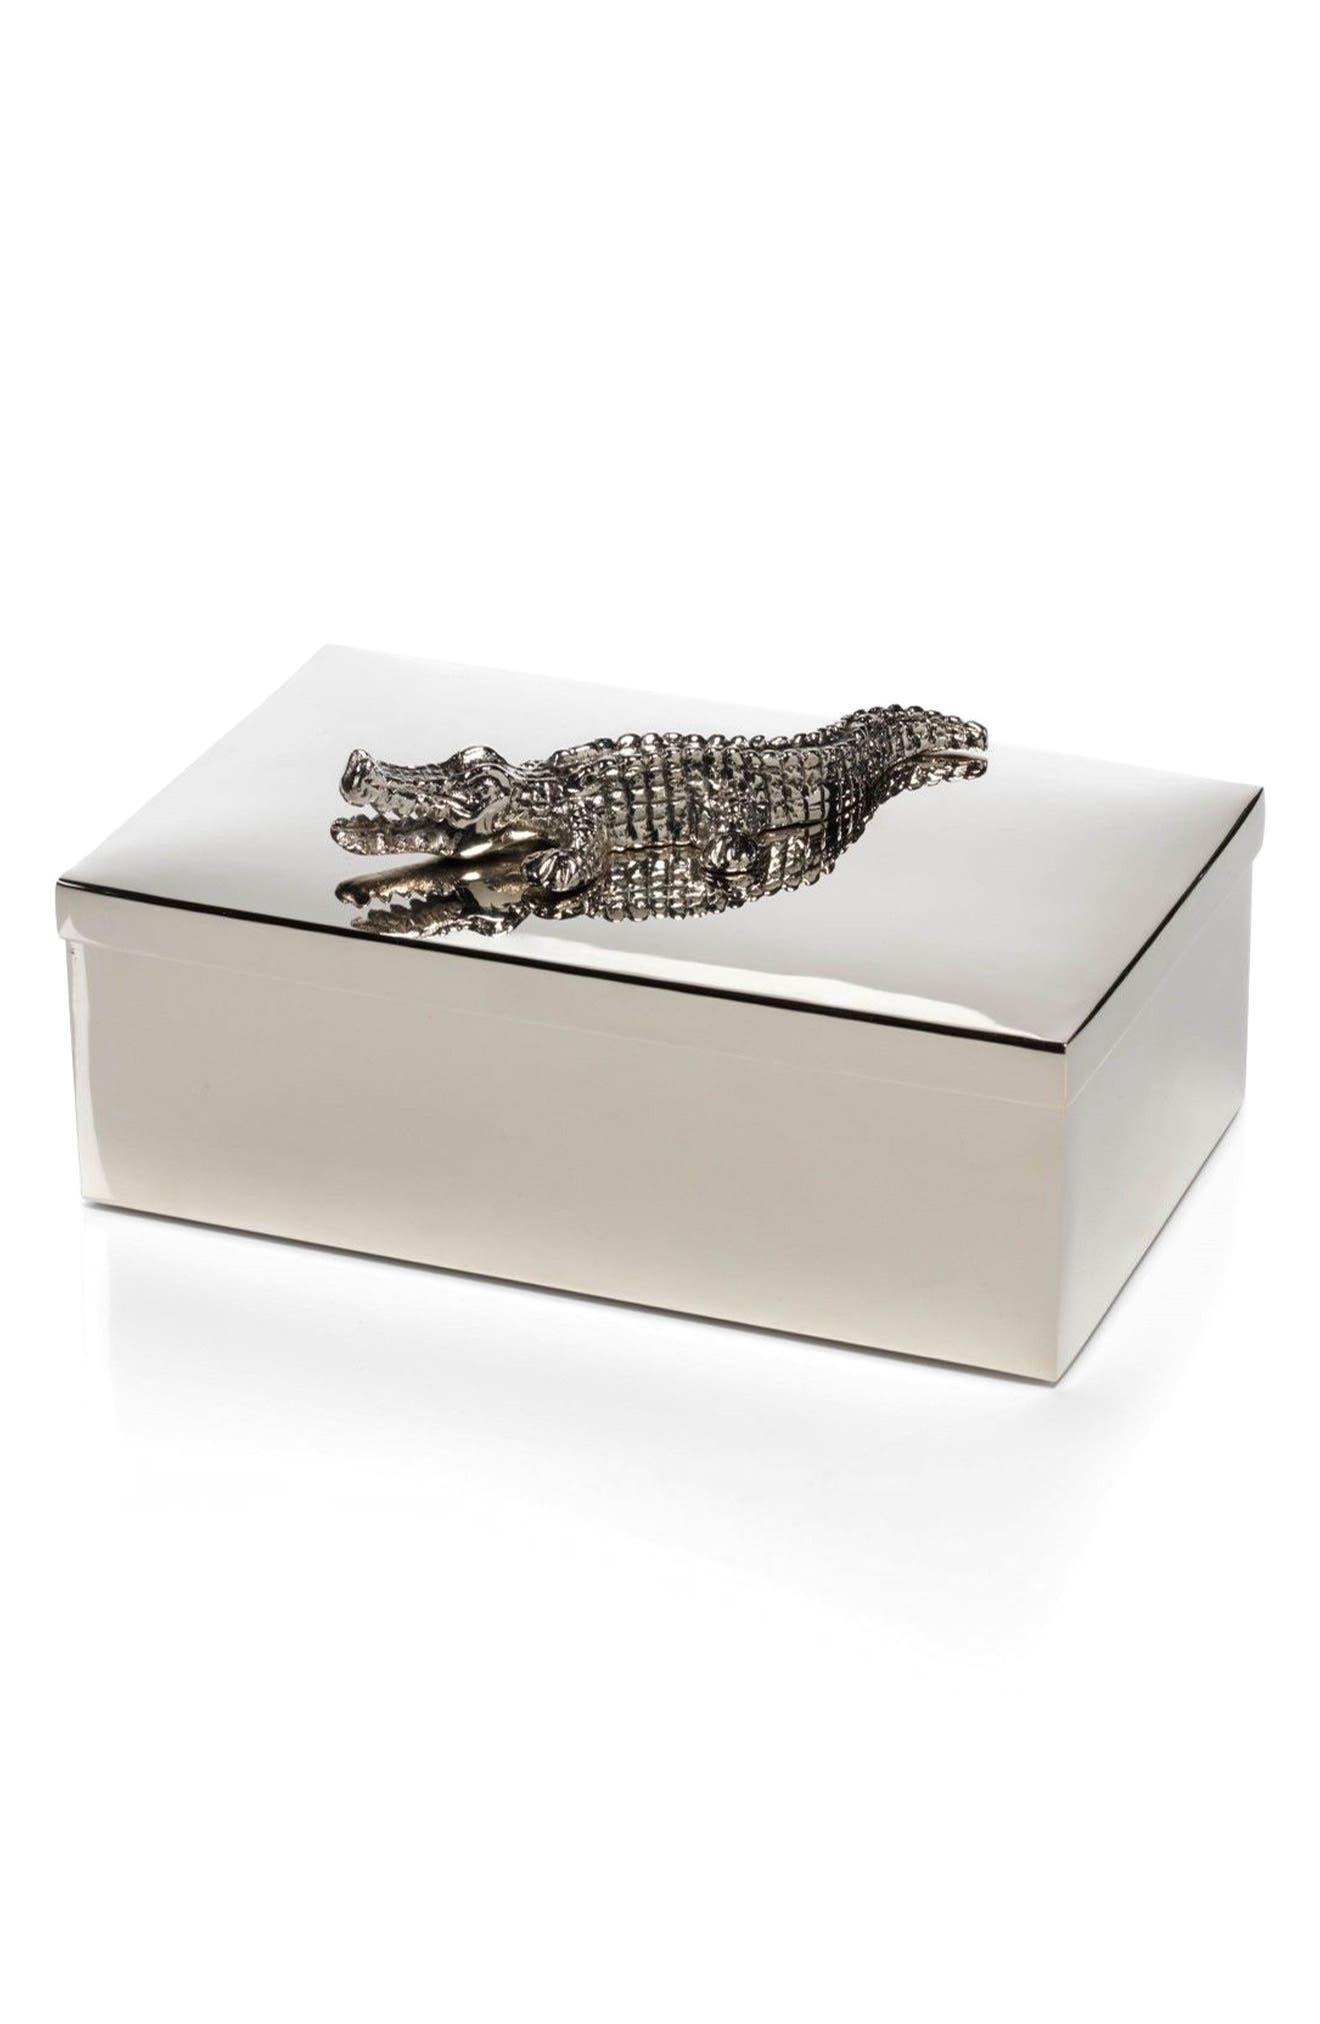 Zodax Crocodile Mirrored Jewelry Box